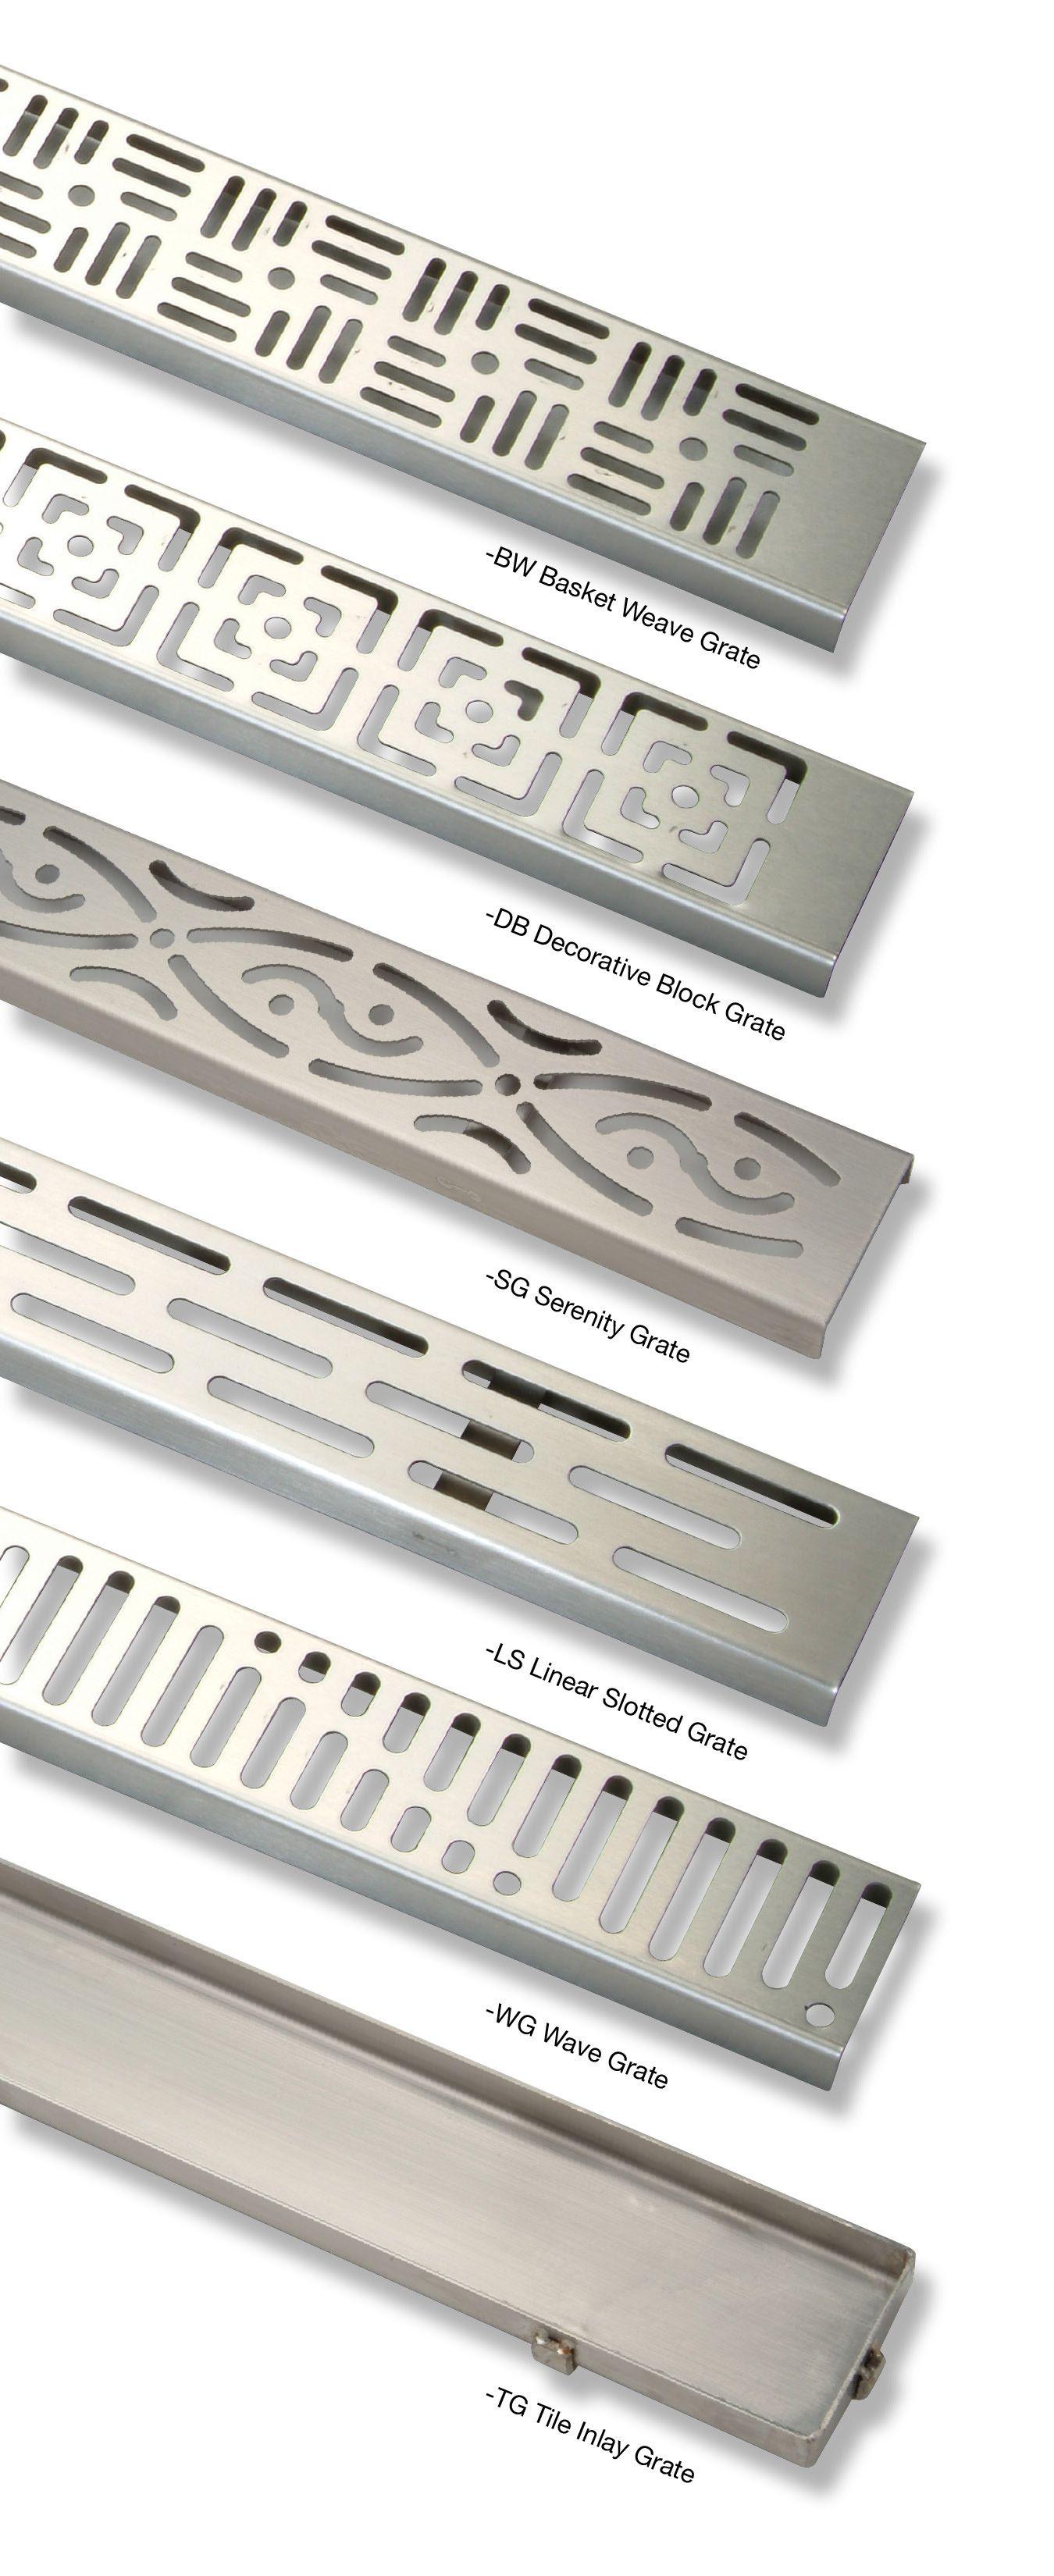 Zurn Zs880 Stainless Steel Linear Shower Drains Texture